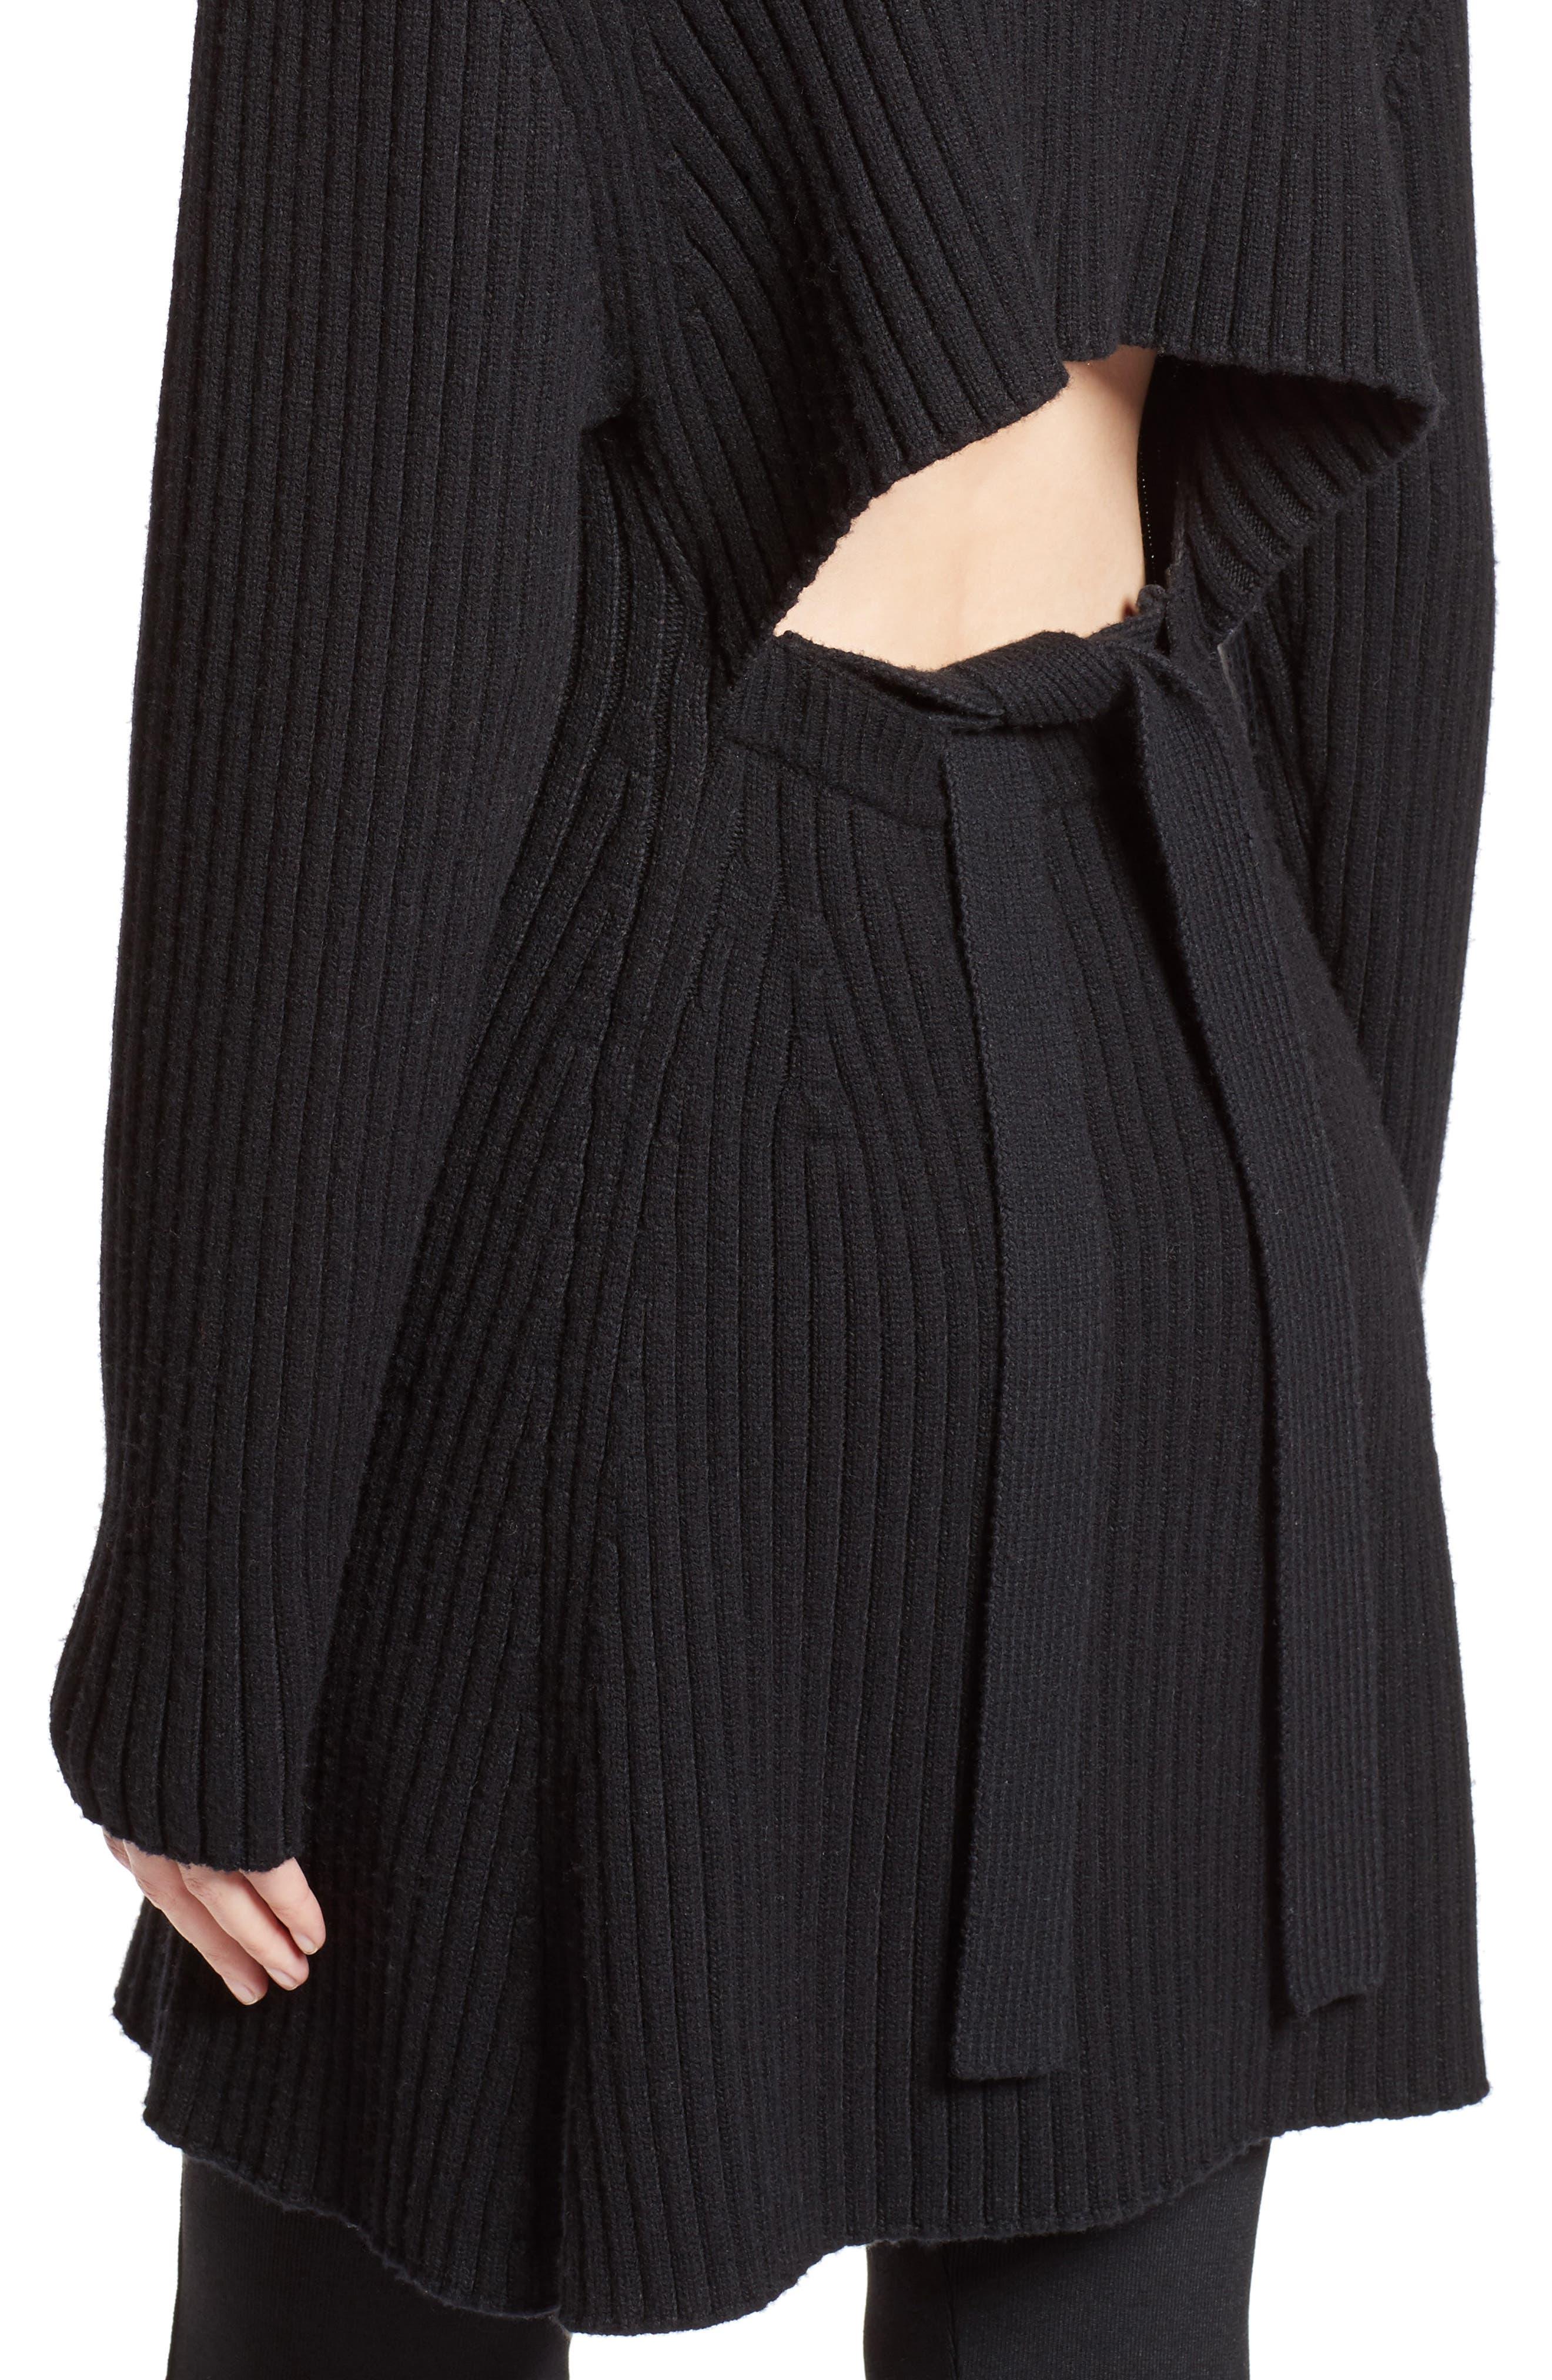 Wool & Cashmere Blend Turtleneck Dress,                             Alternate thumbnail 6, color,                             Black